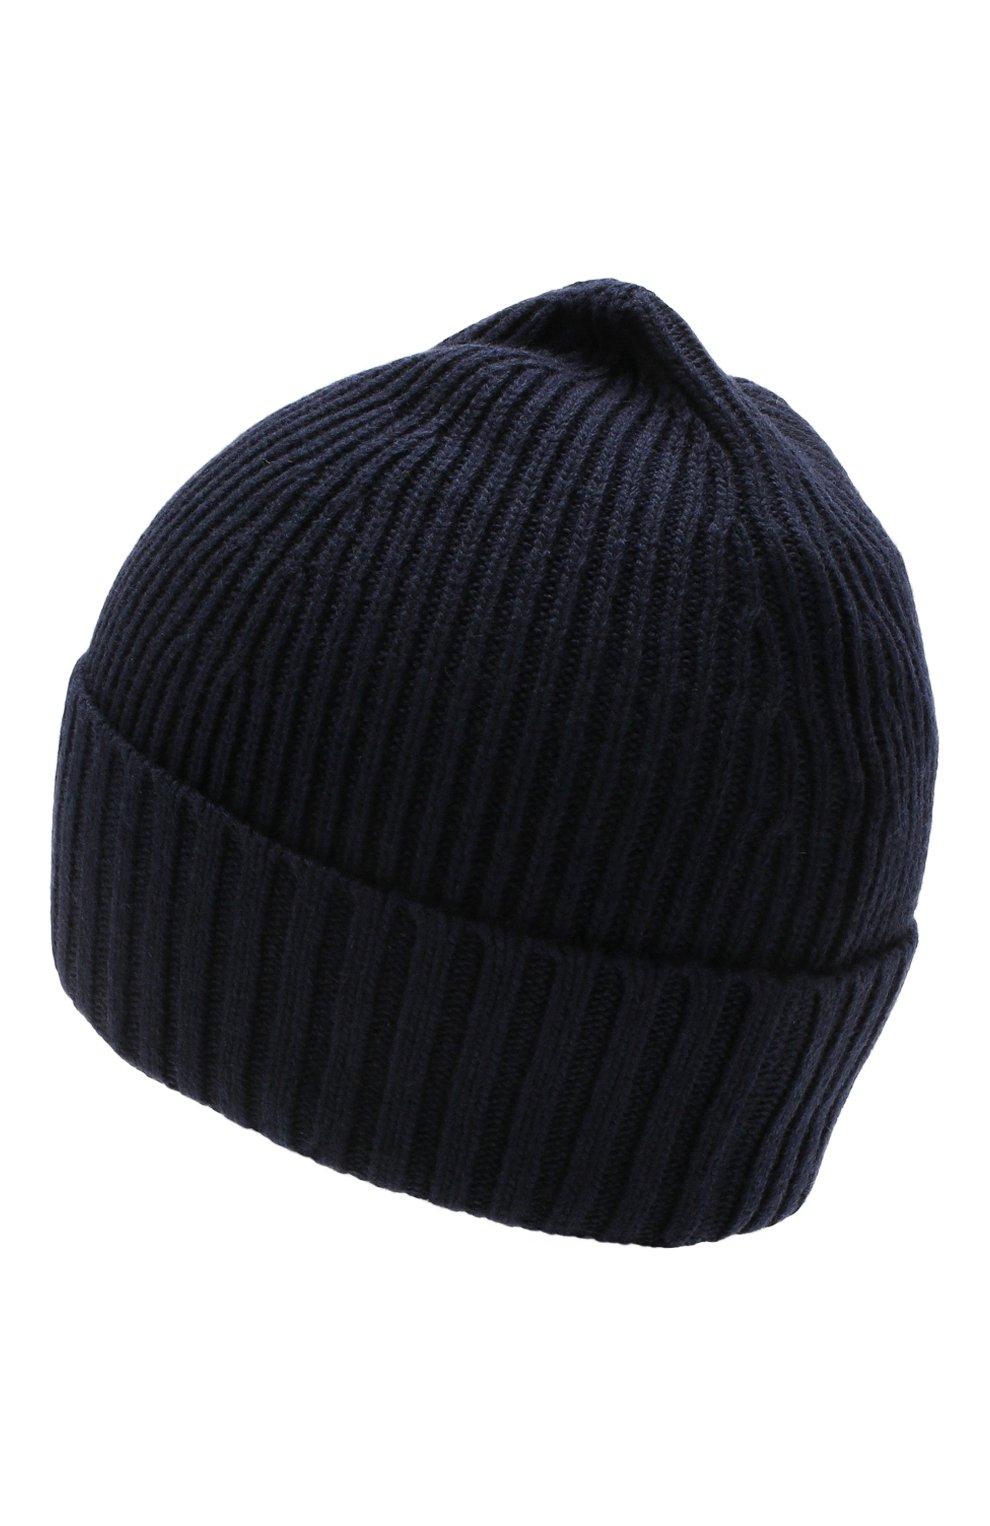 Детского шапка STONE ISLAND темно-синего цвета, арт. 7116N03A6   Фото 2